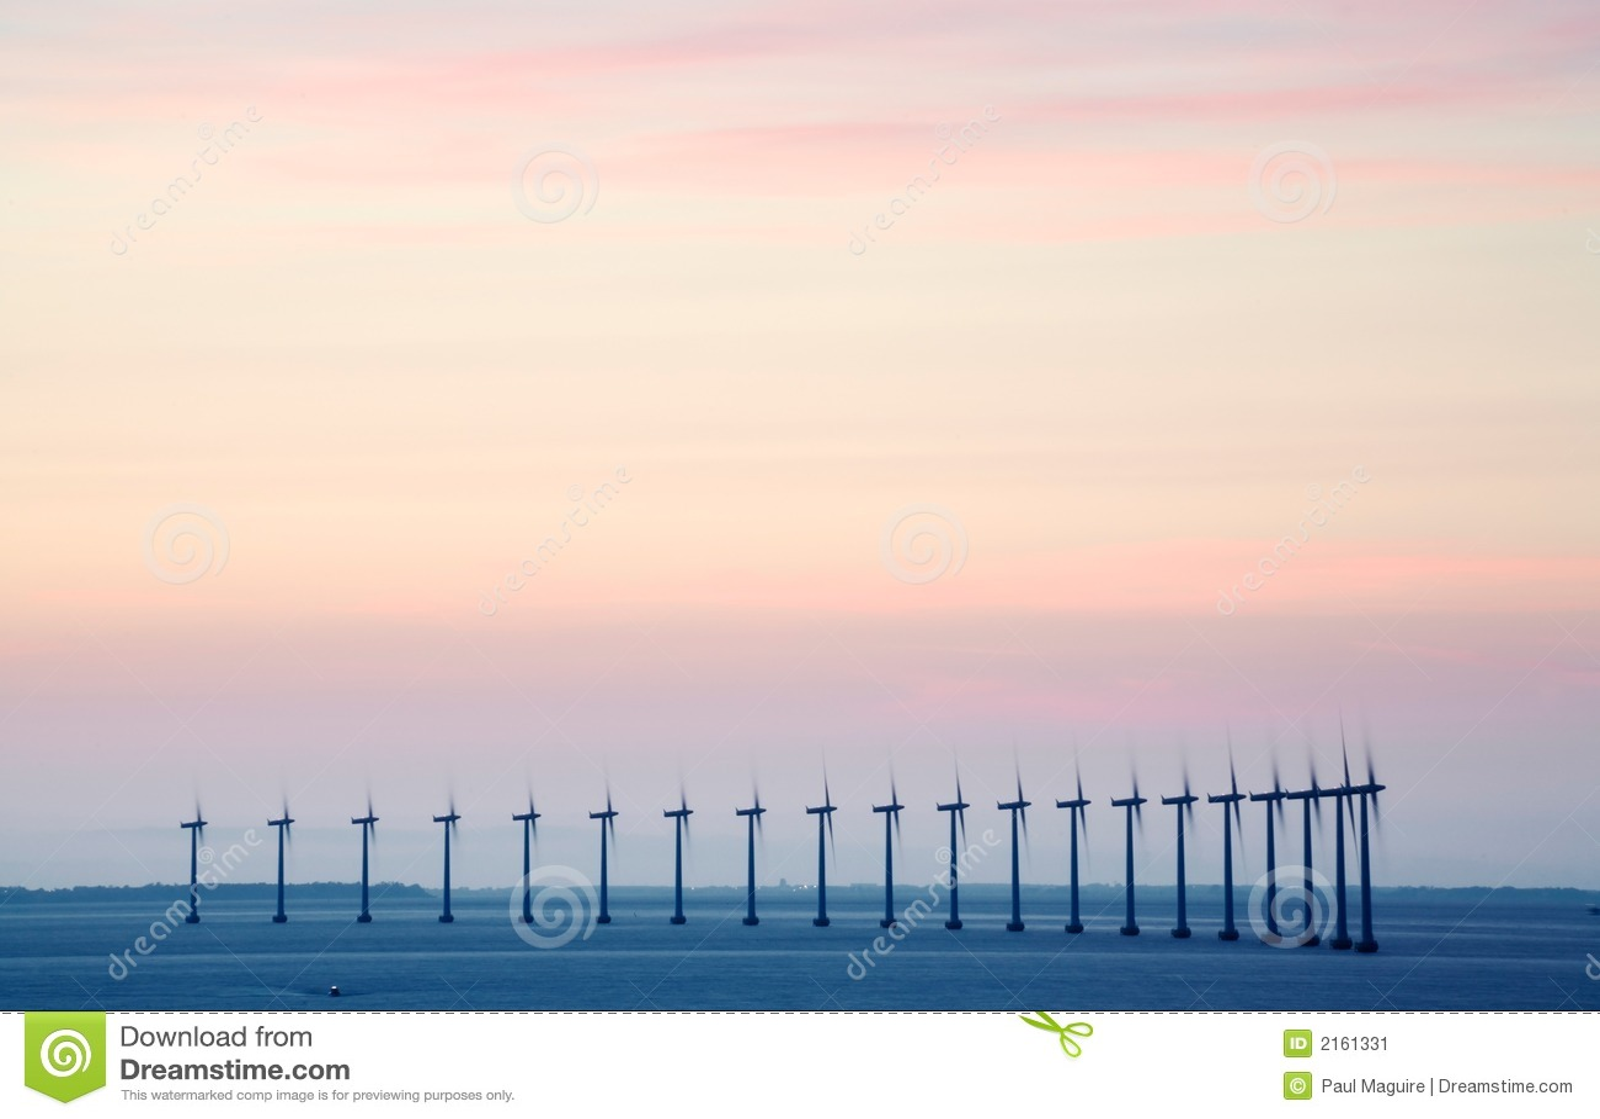 Ferme de vent extraterritorial